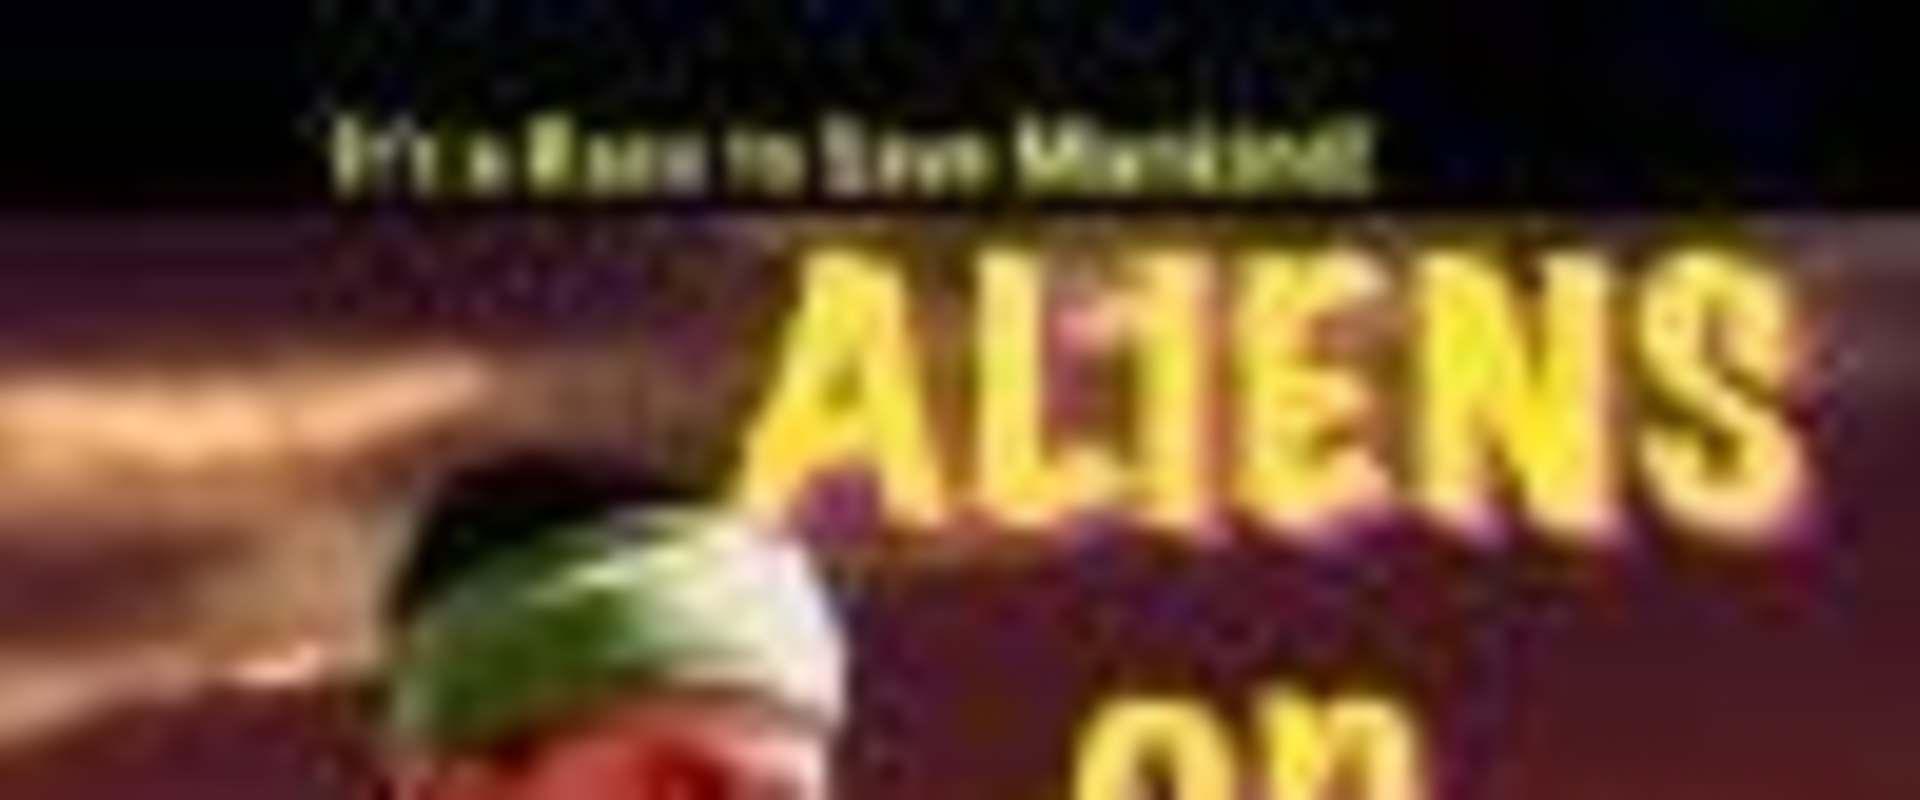 Watch Aliens on Crack on Netflix Today! | NetflixMovies com